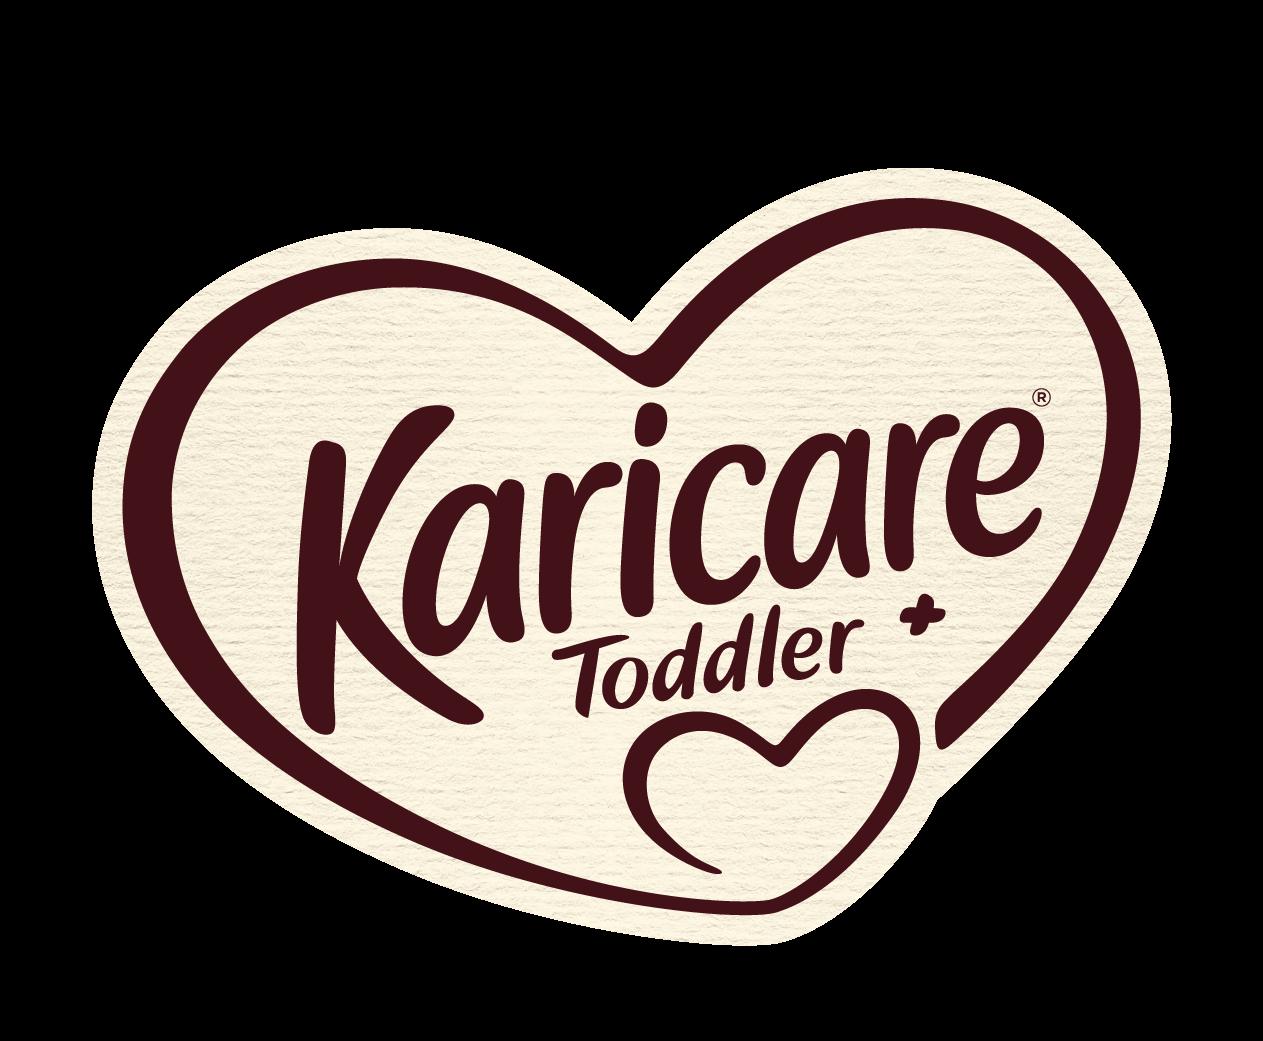 Image of Karicare logo for the Karicare Toddler Milk Review